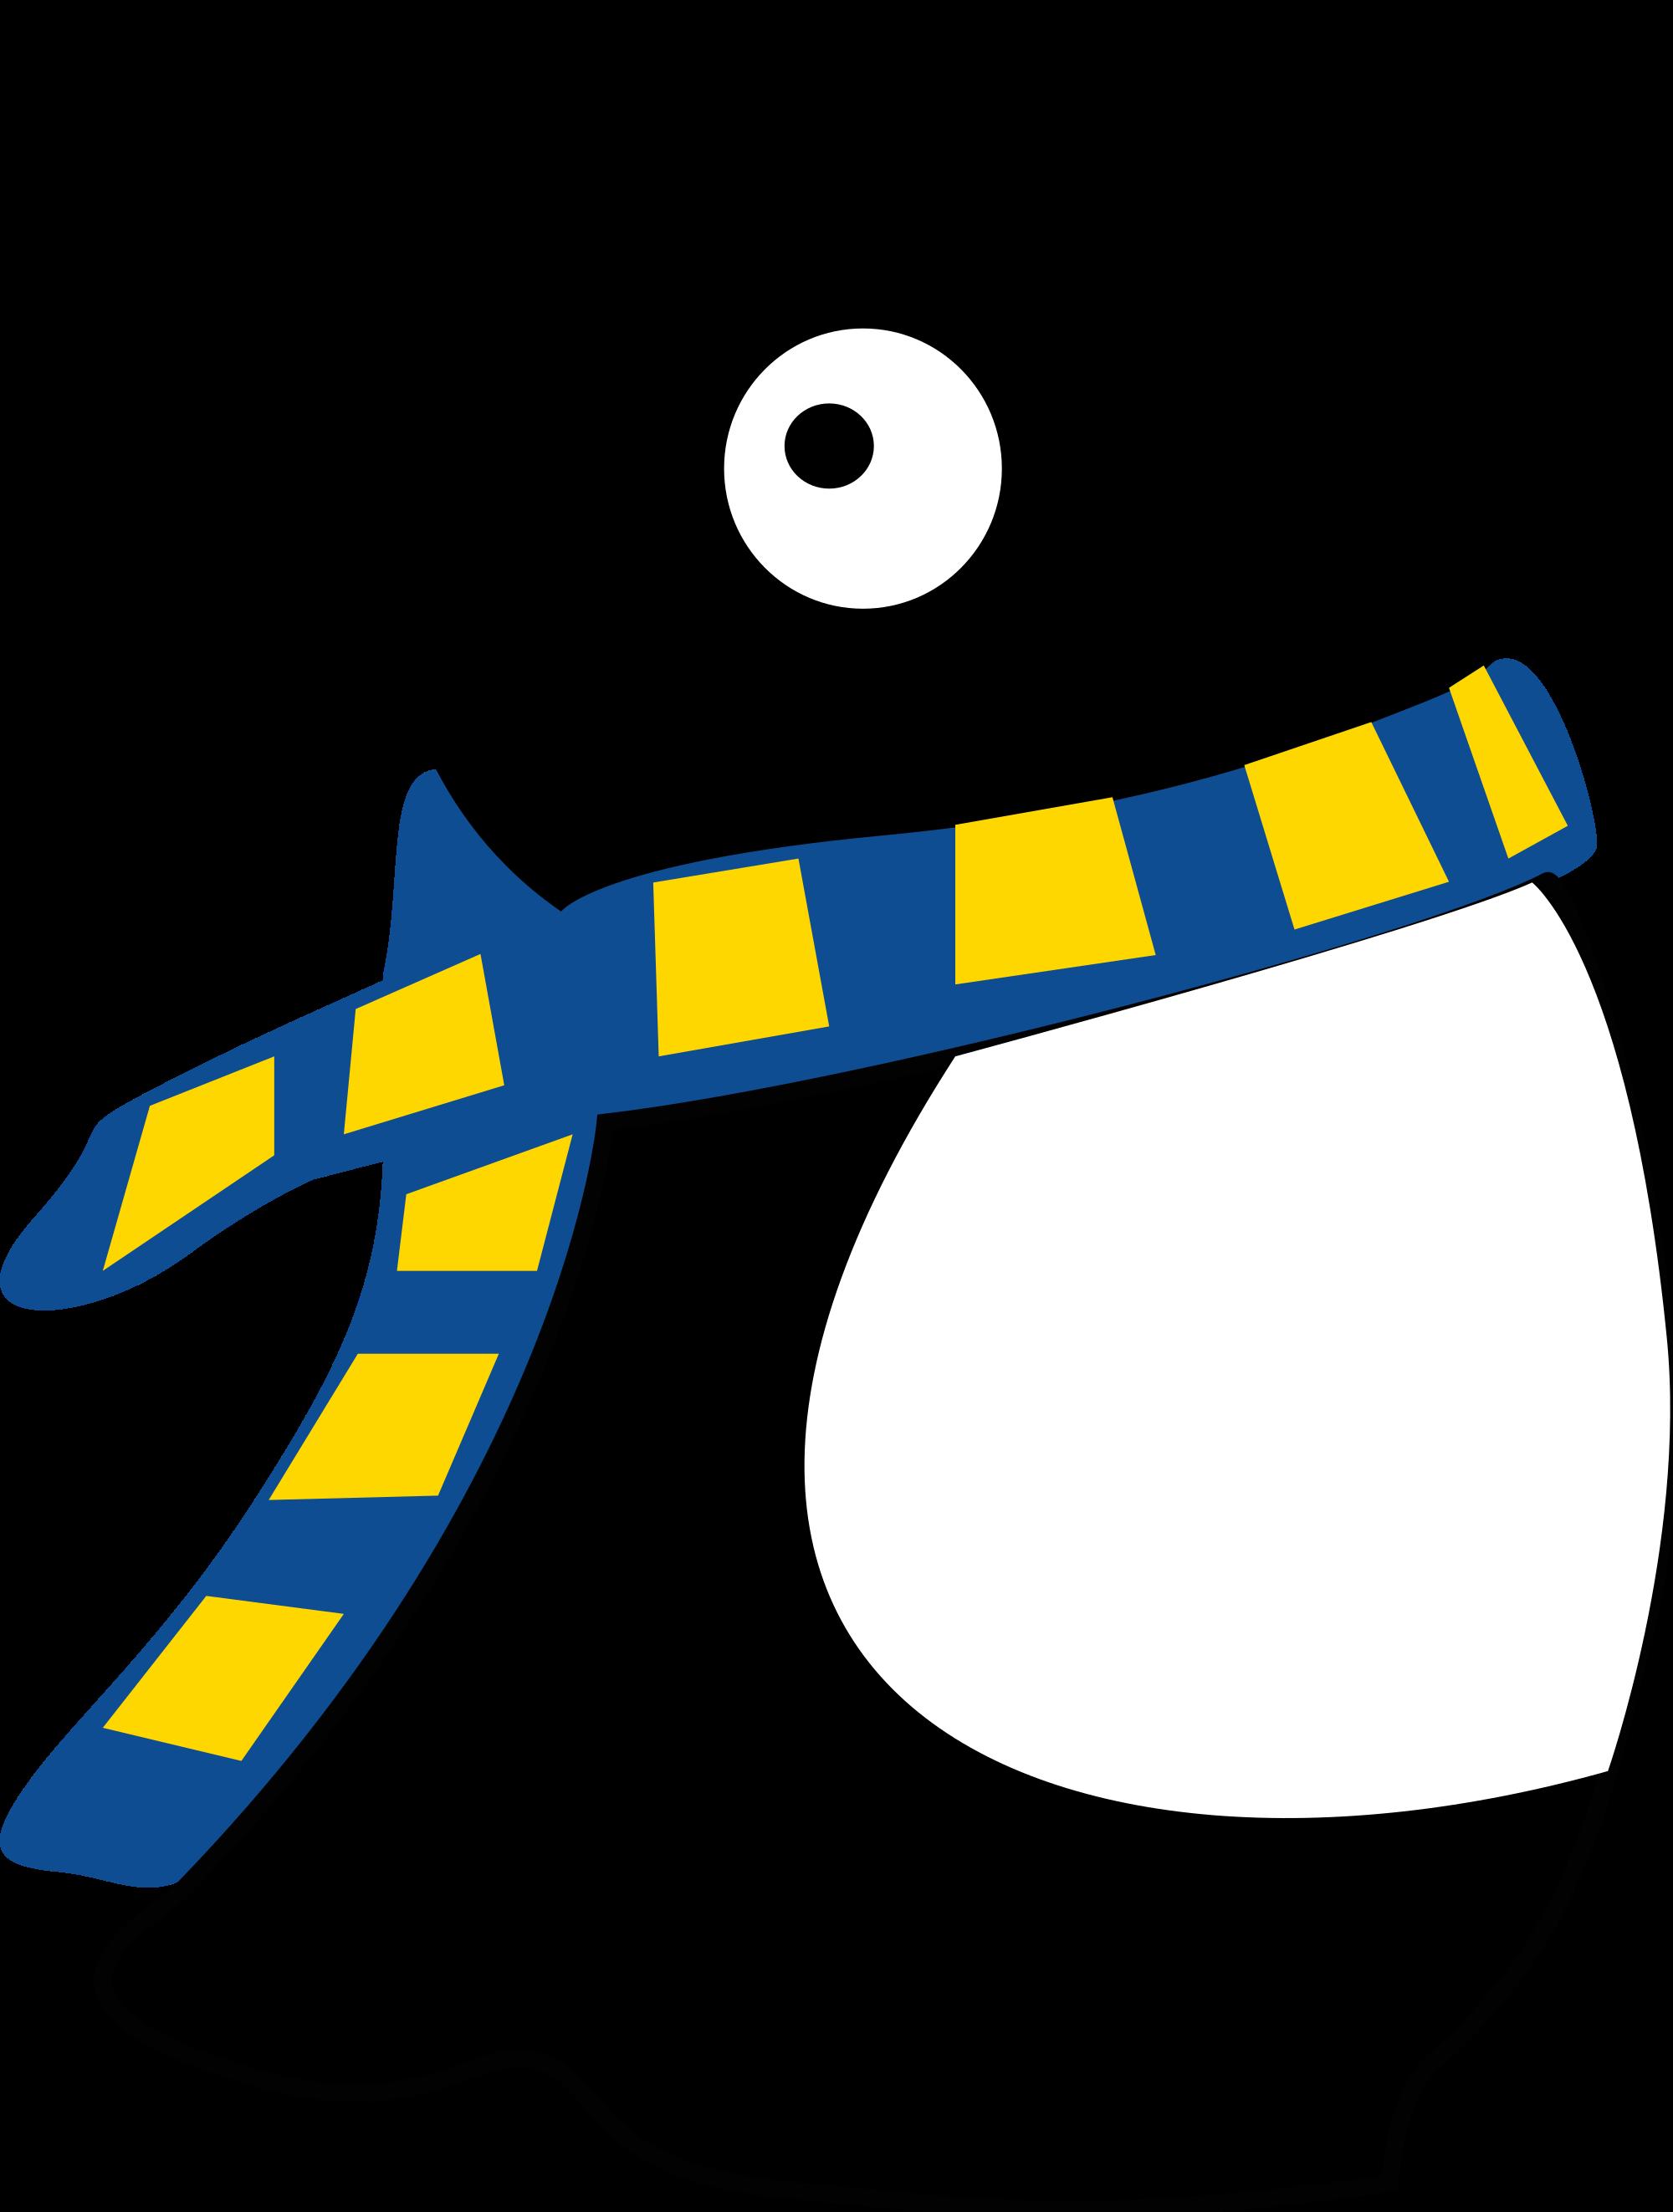 Clipart penquin svg. File ocf penguin wikimedia